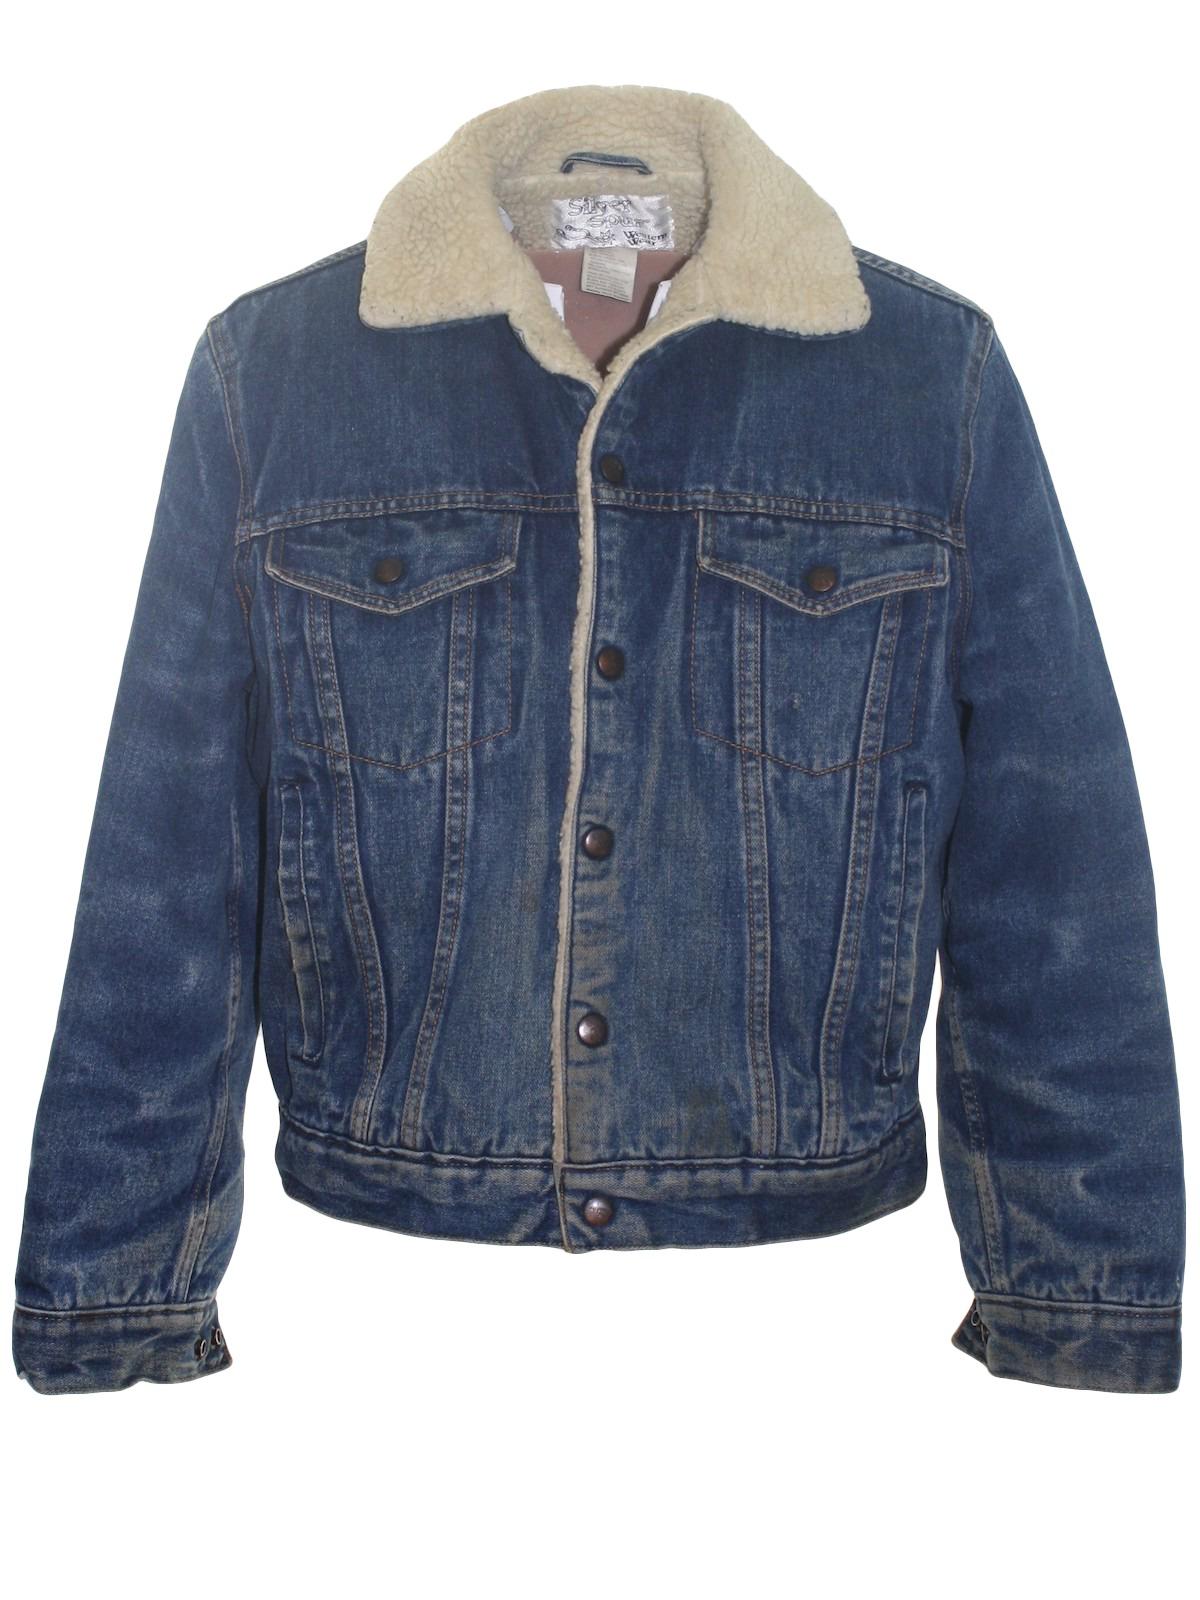 Retro 1980 s Jacket (Silver Spur Western Wear)   80s -Silver Spur ... 7a613ff42048